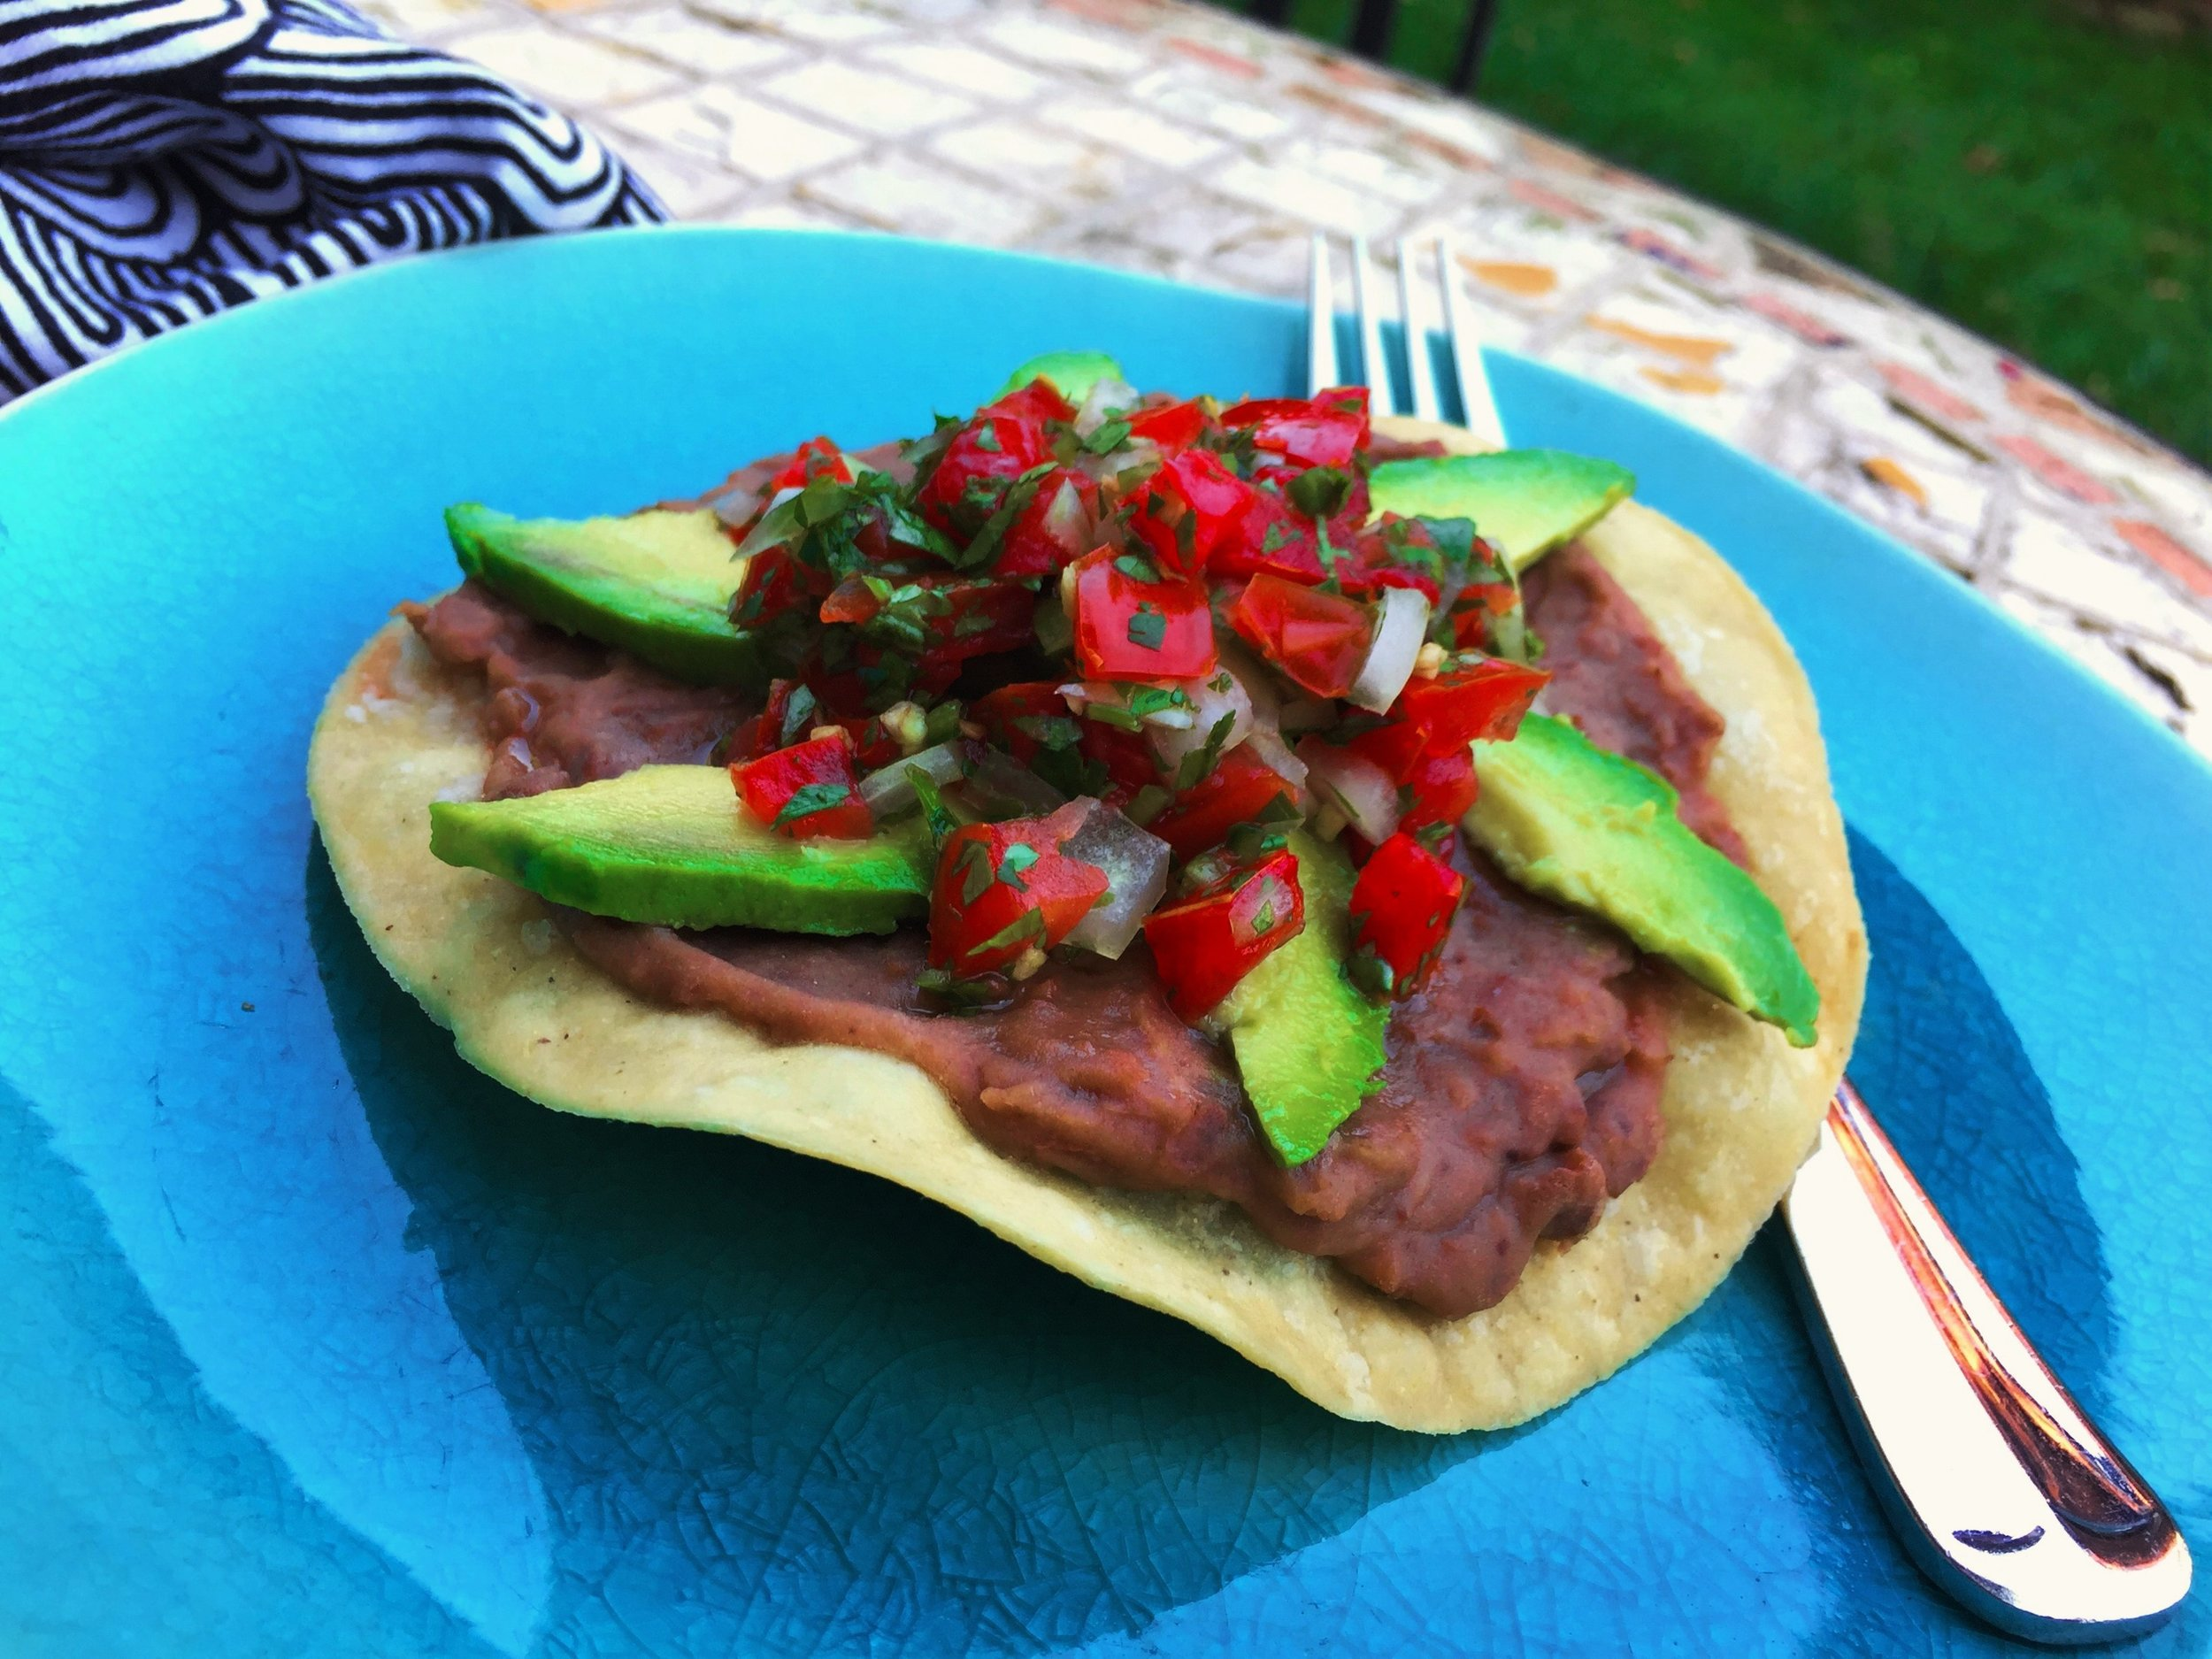 Tostada with Avocado and Pico de Gallo made in the Adventure Kitchen.